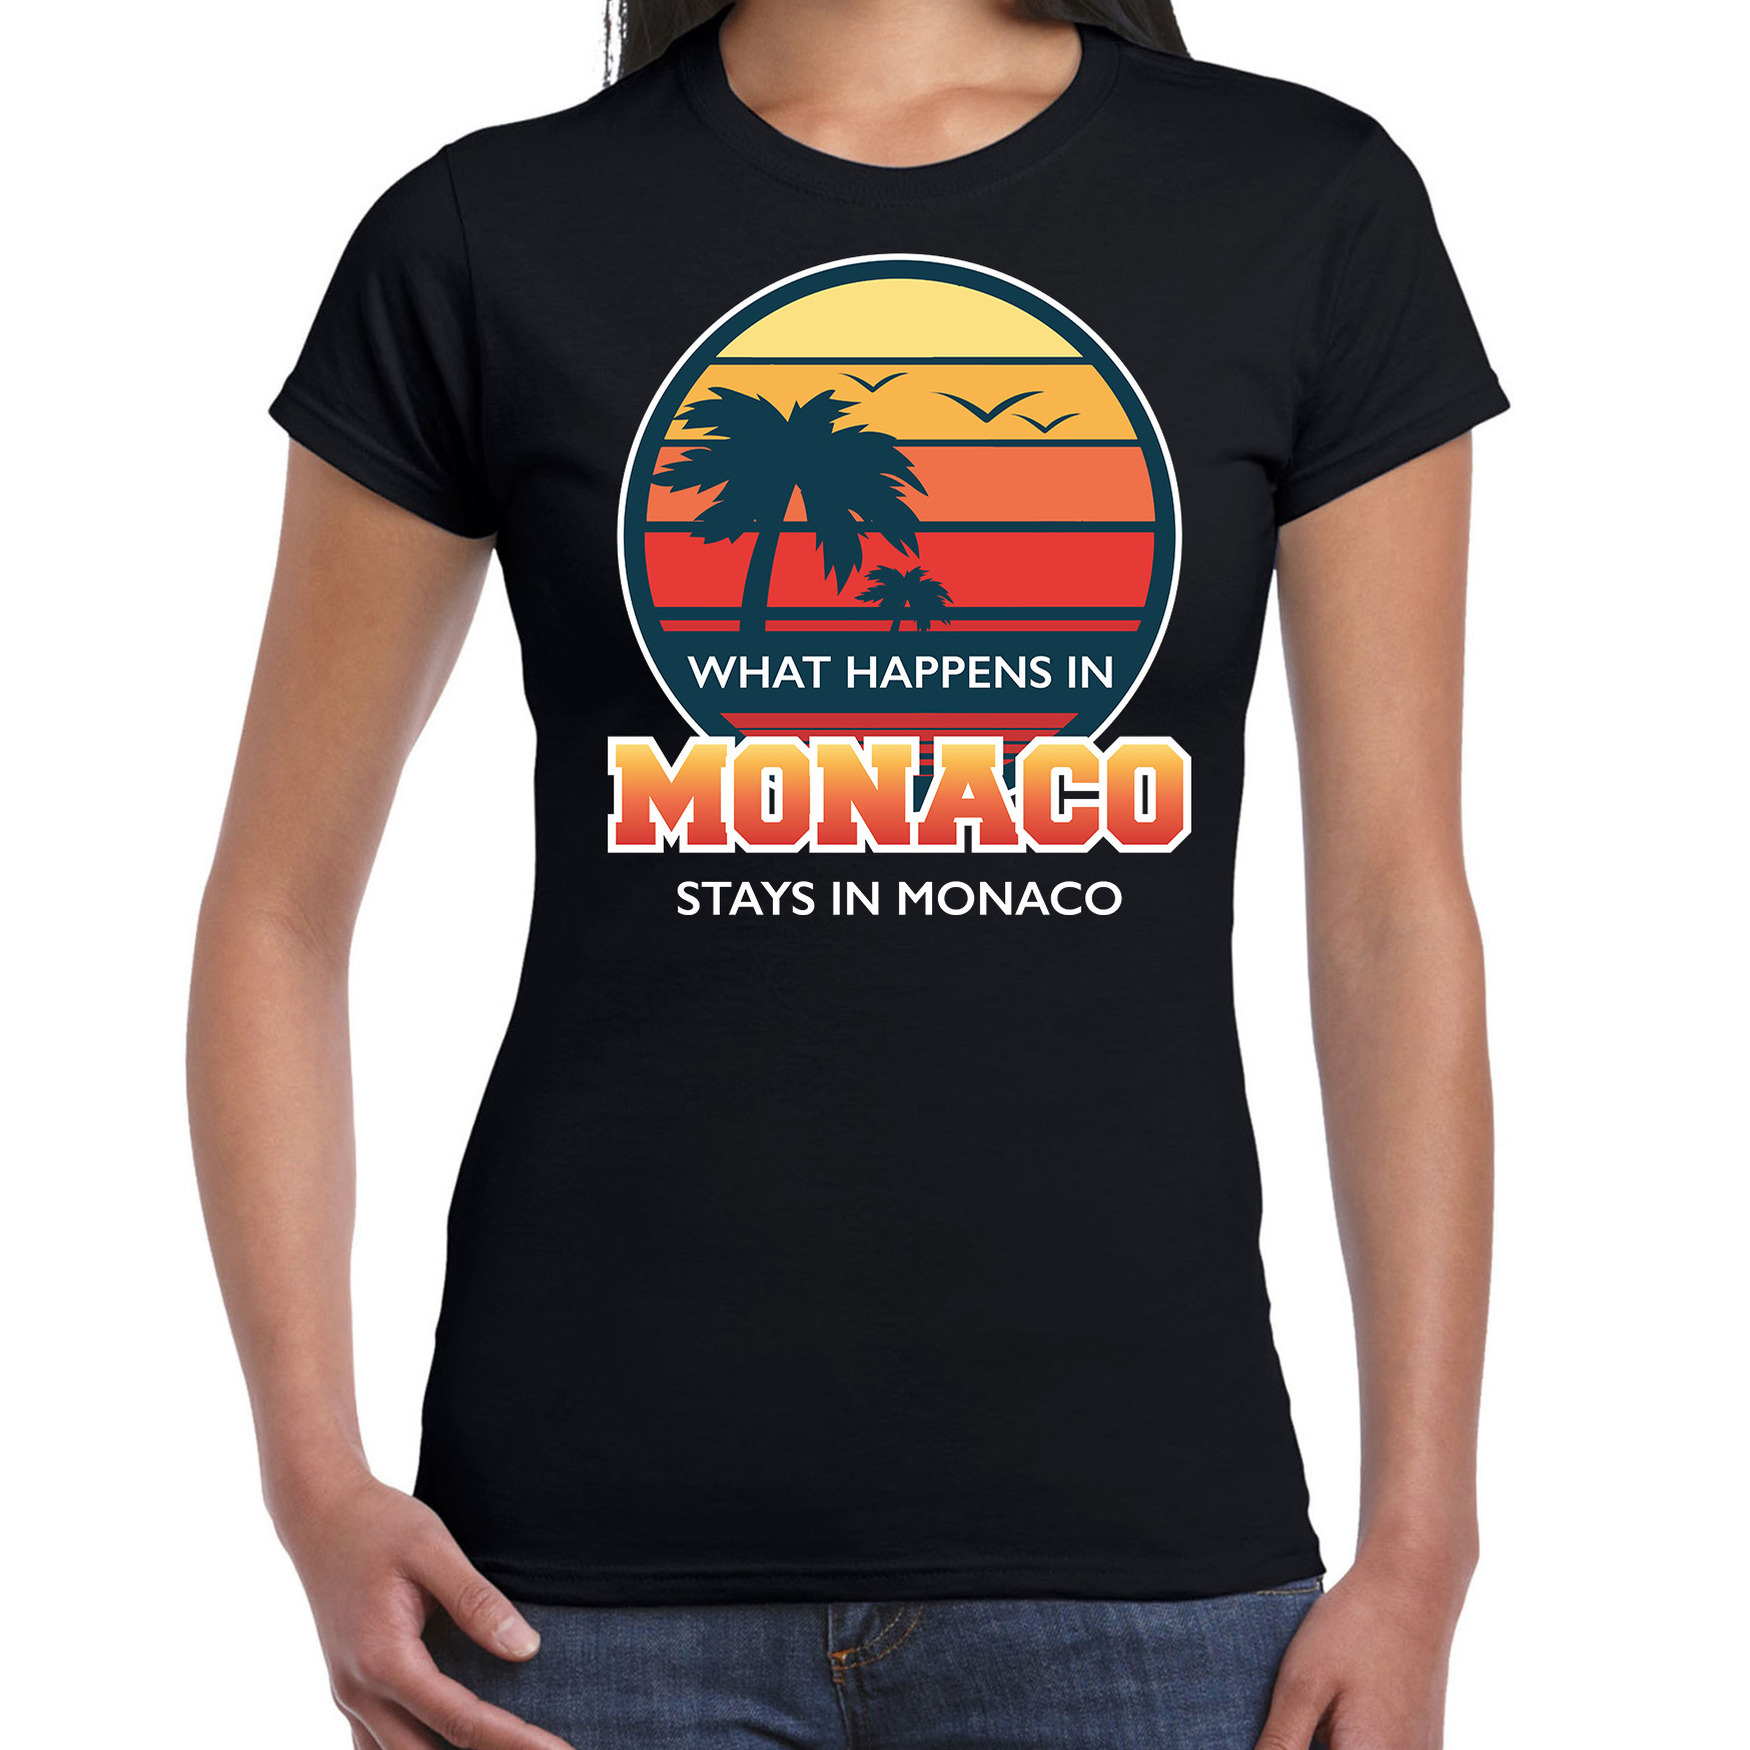 What happens in Monaco stays in Monaco shirt beach party - vakantie outfit - kleding zwart voor dame